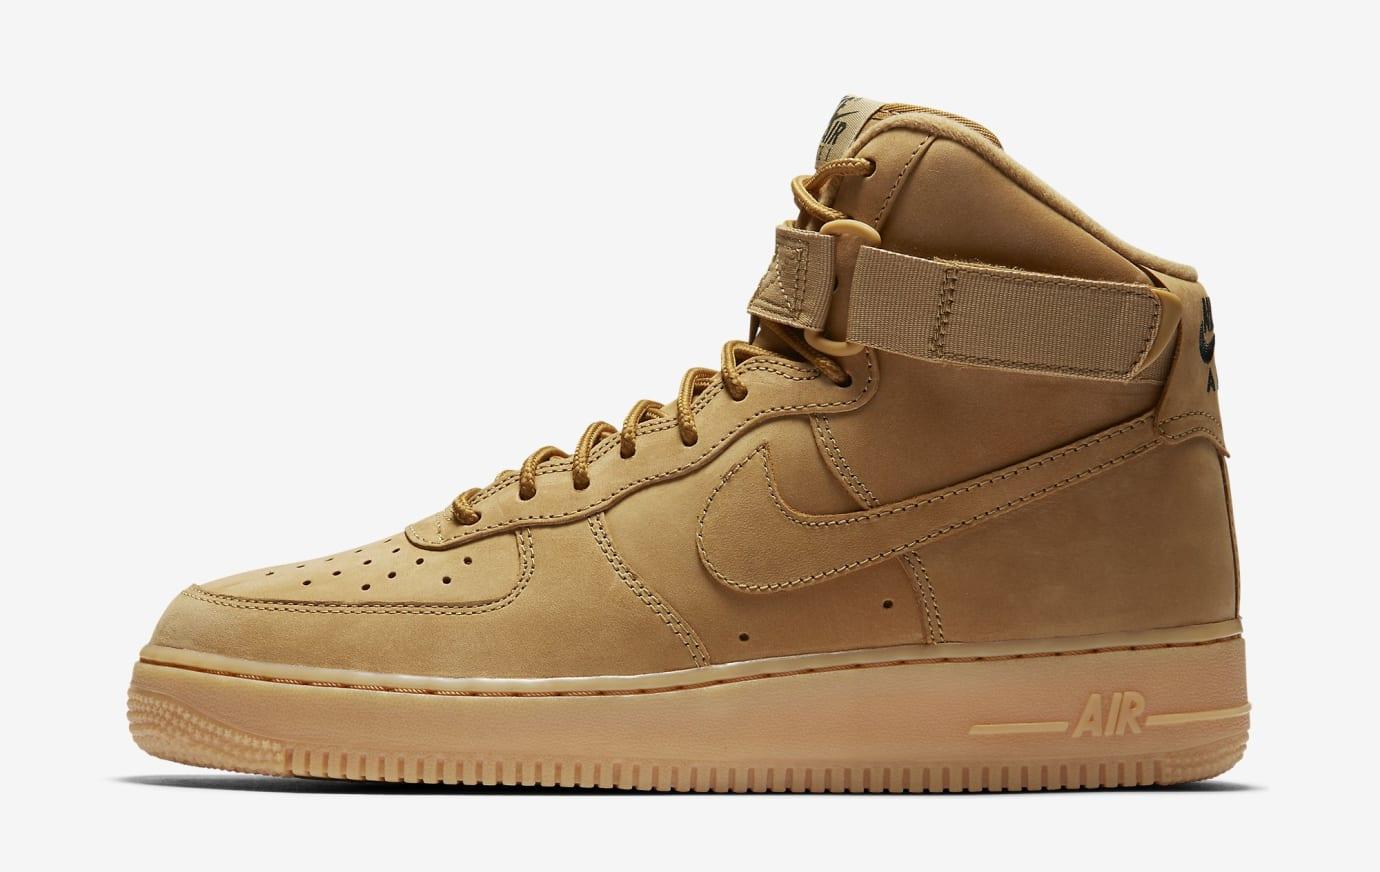 'Wheat' Nike Air Force 1 High 882096-200 (Medial)